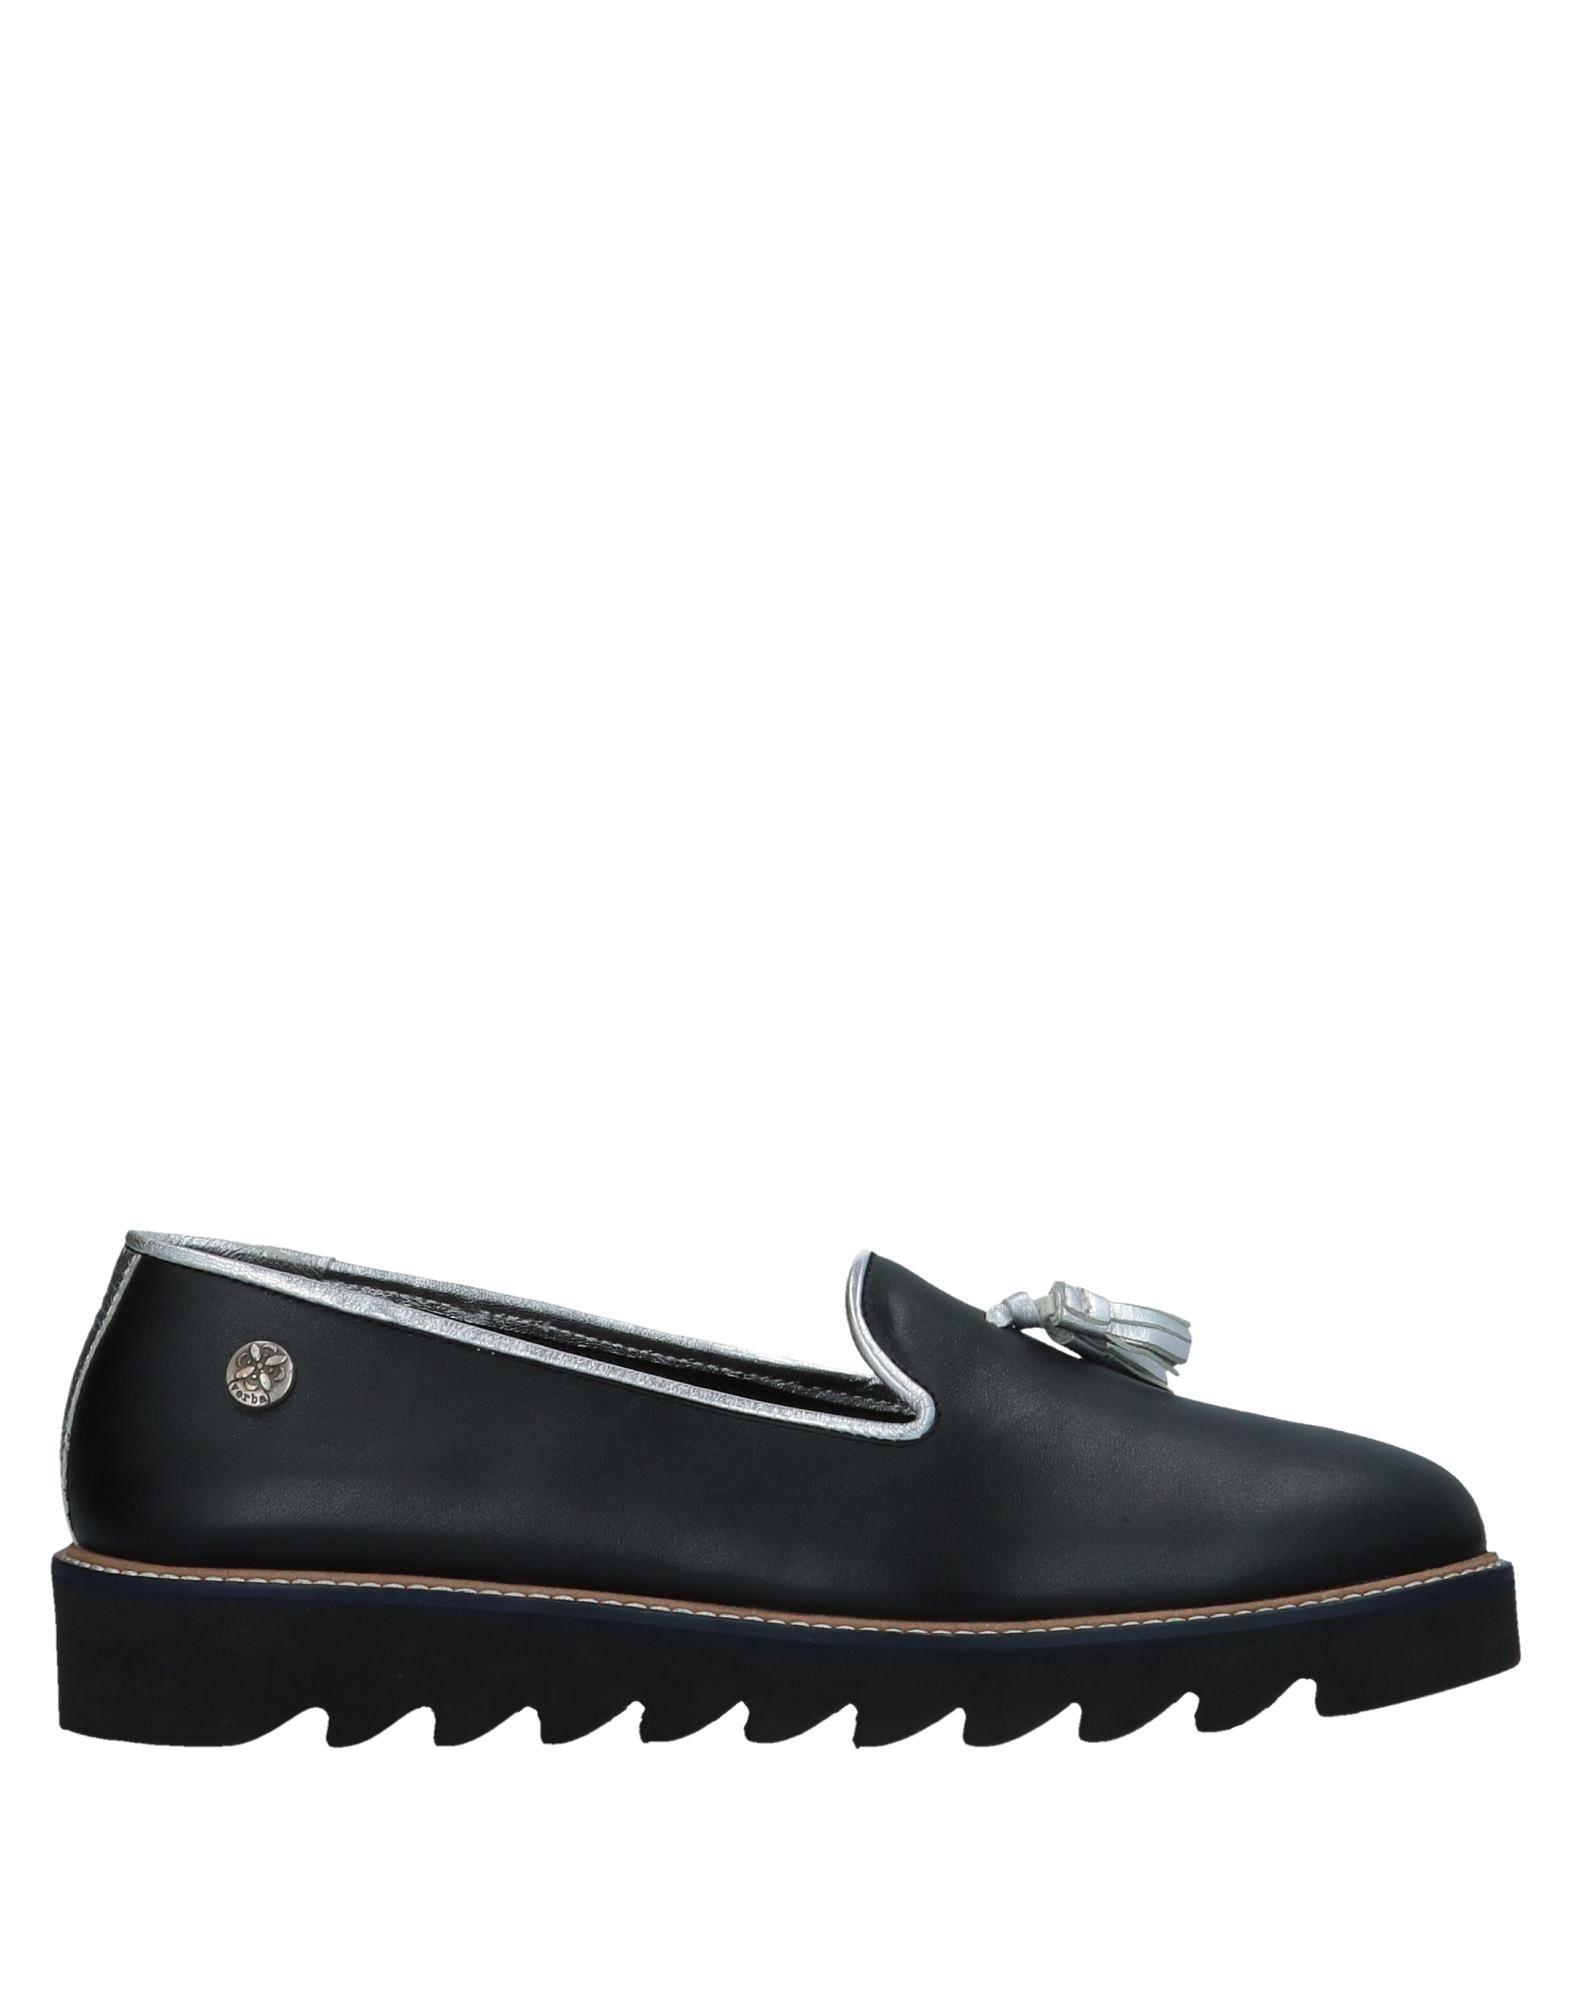 Stilvolle billige Schuhe ( Verba ) Mokassins Damen  11508985FK